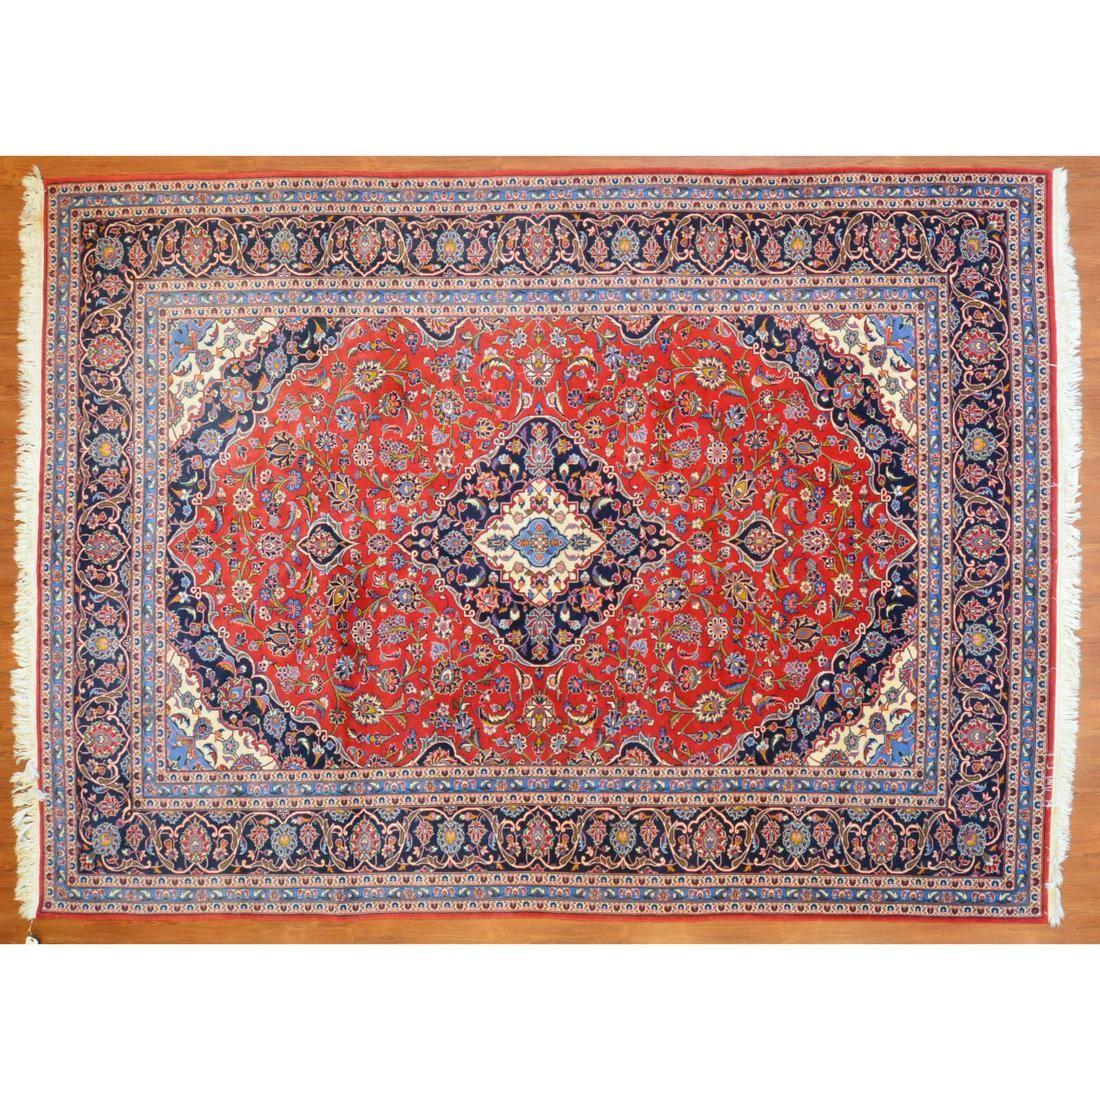 Kashan Rug, Persia, 8.1 x 11